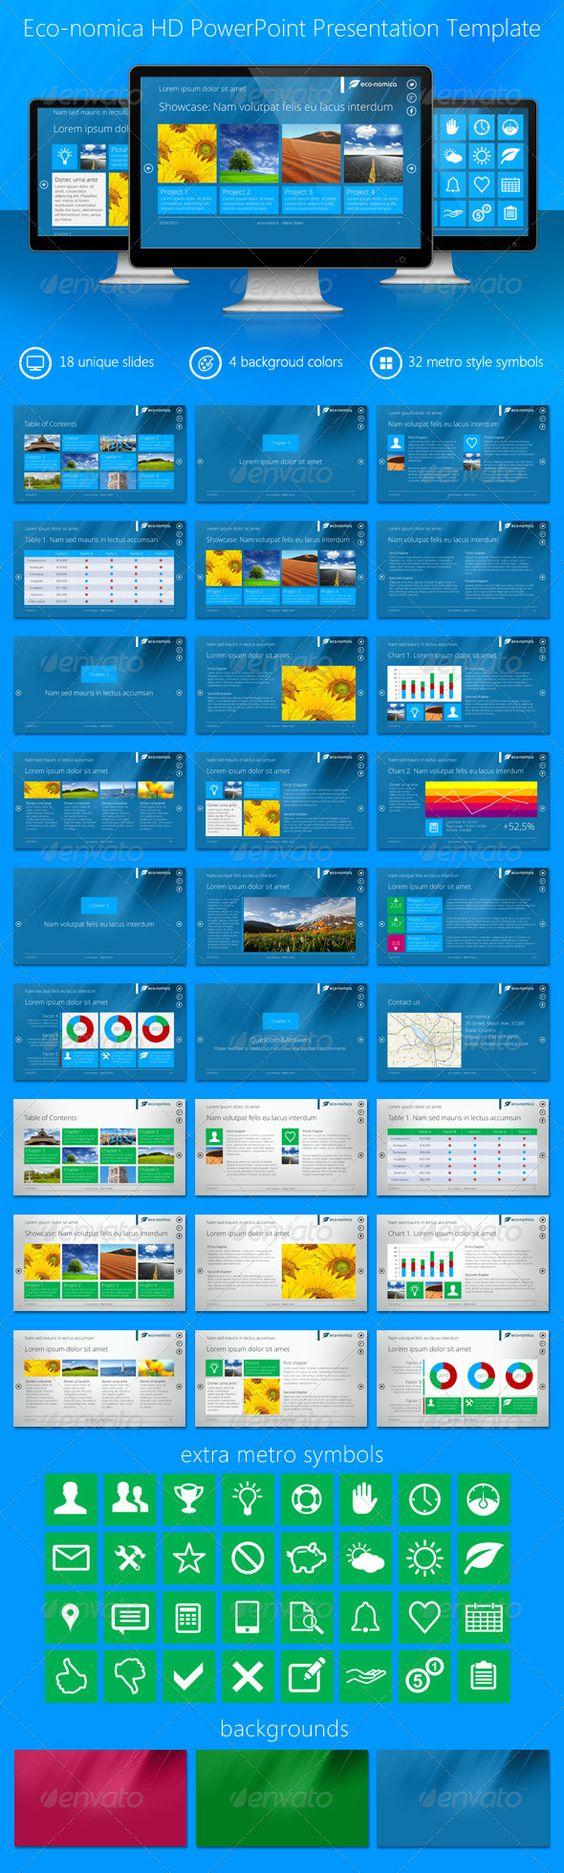 Buy powerpoint presentation